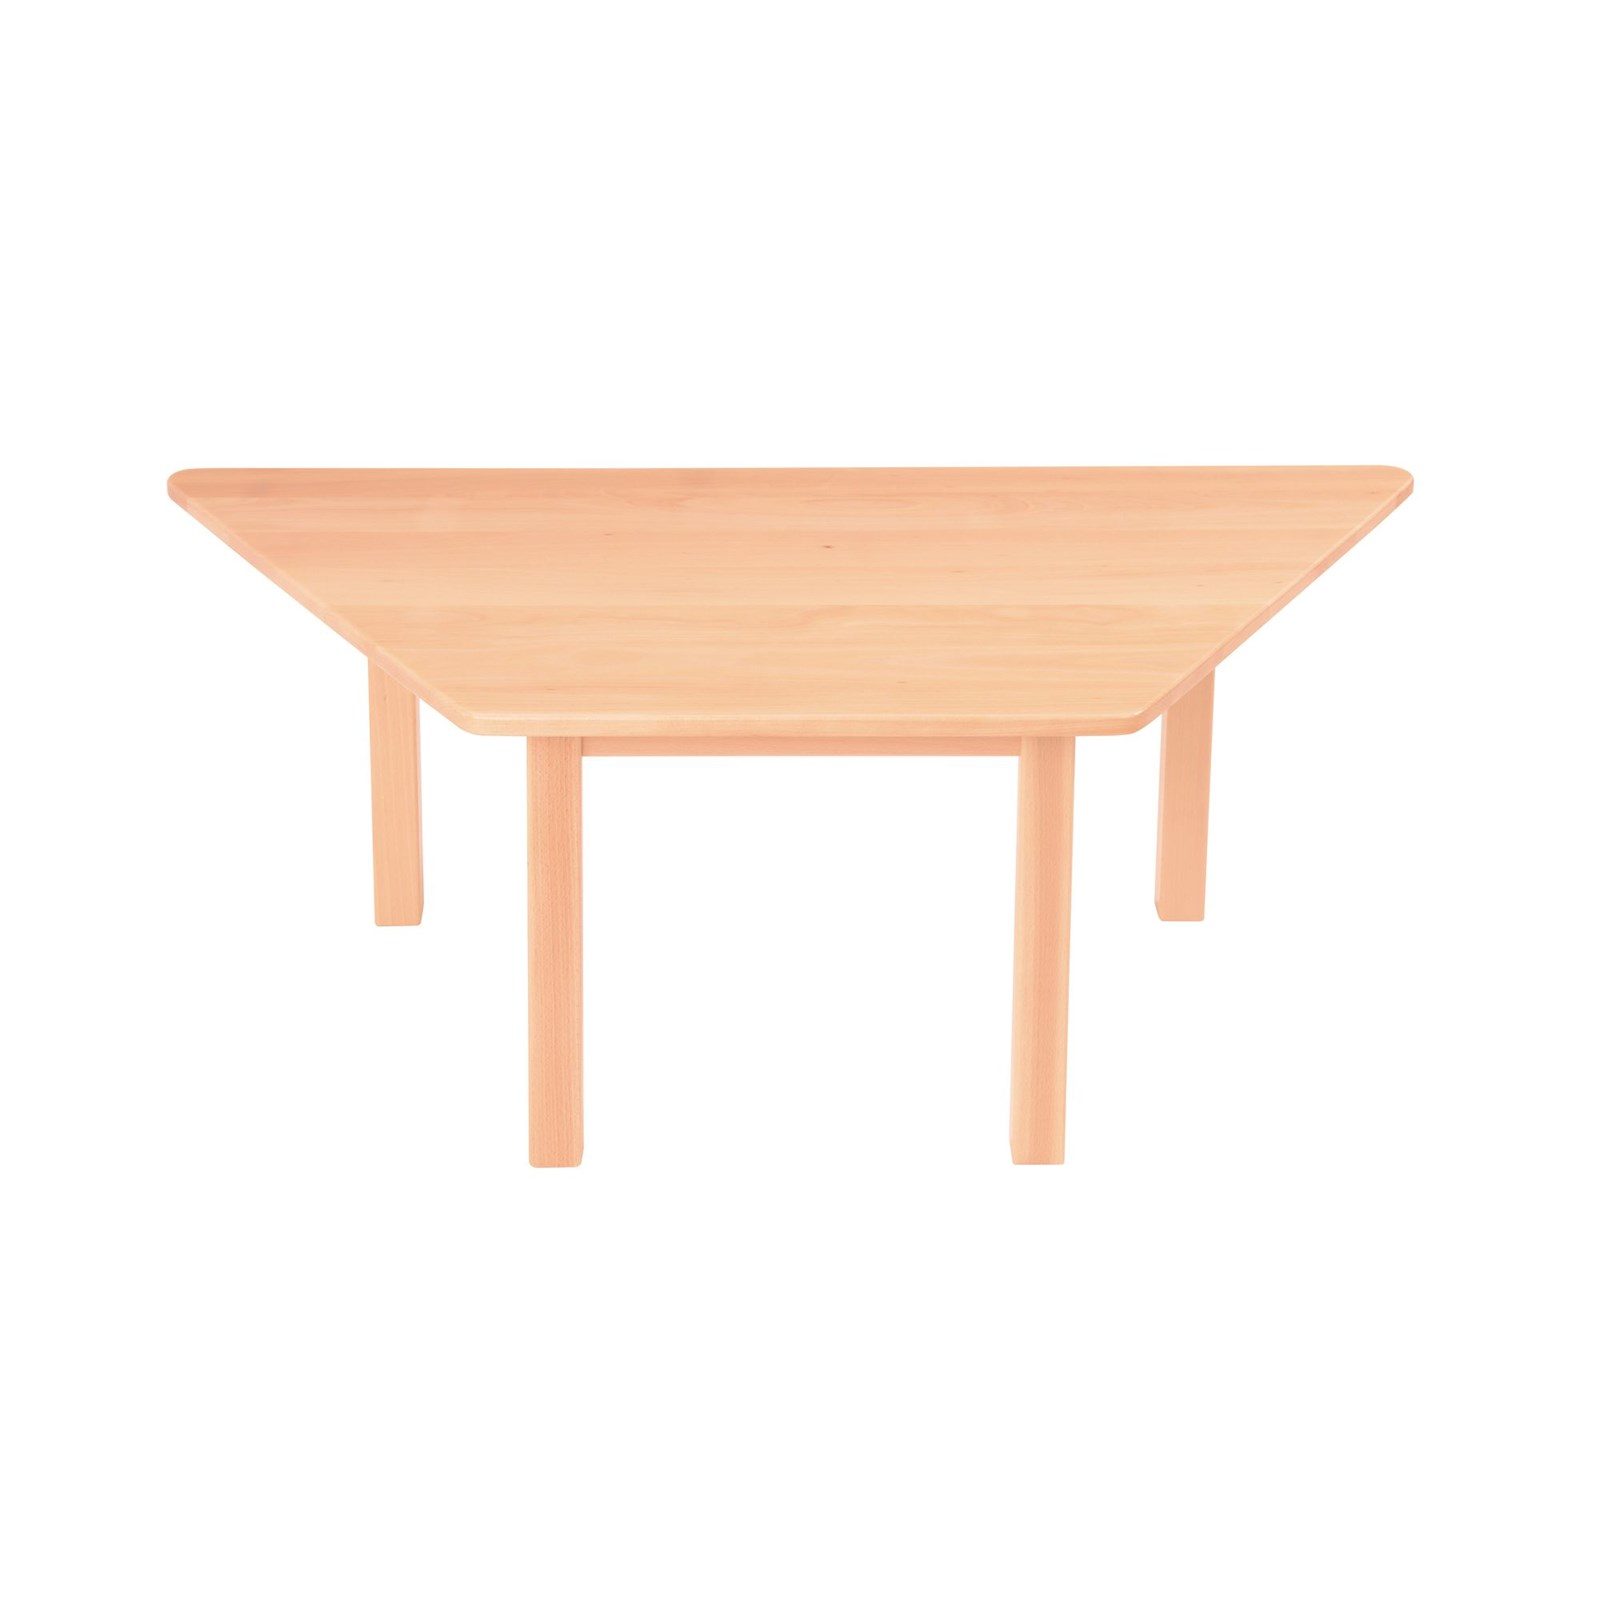 Galt Trapezoidal Table W1200xd600x530mm